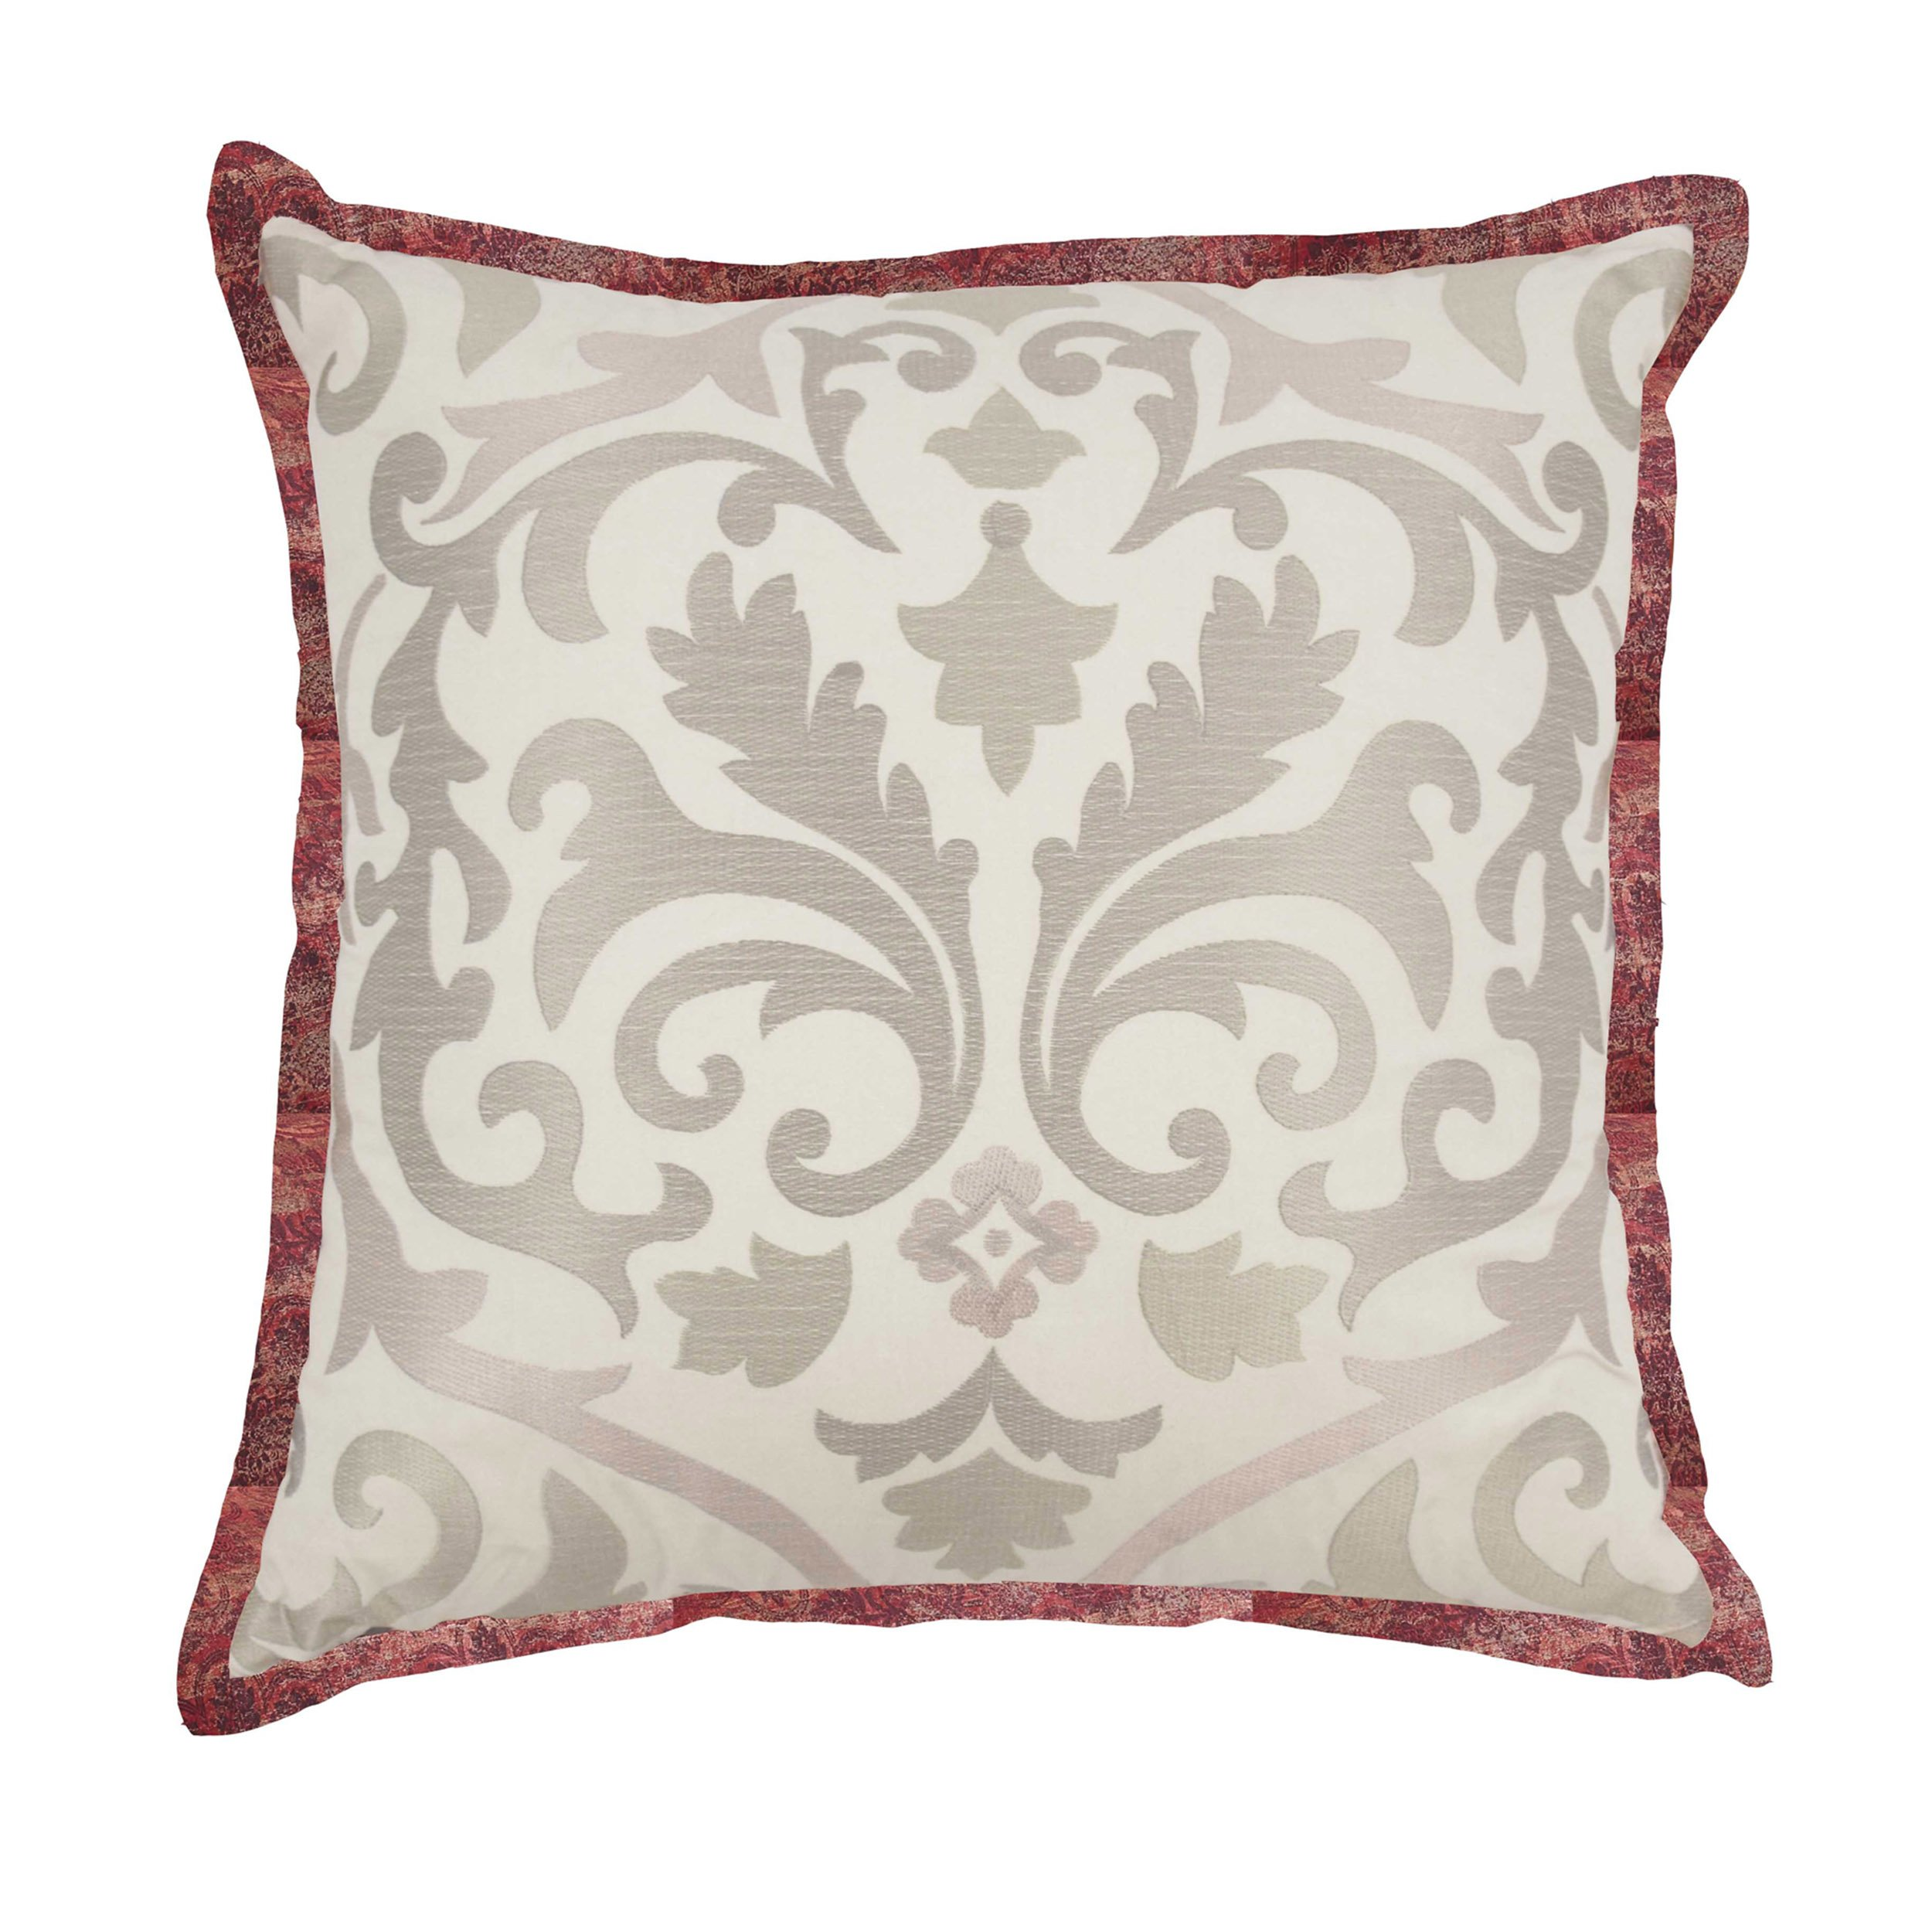 WAVERLY Fresco Flourish Decorative Pillow, 18x18, Jewel